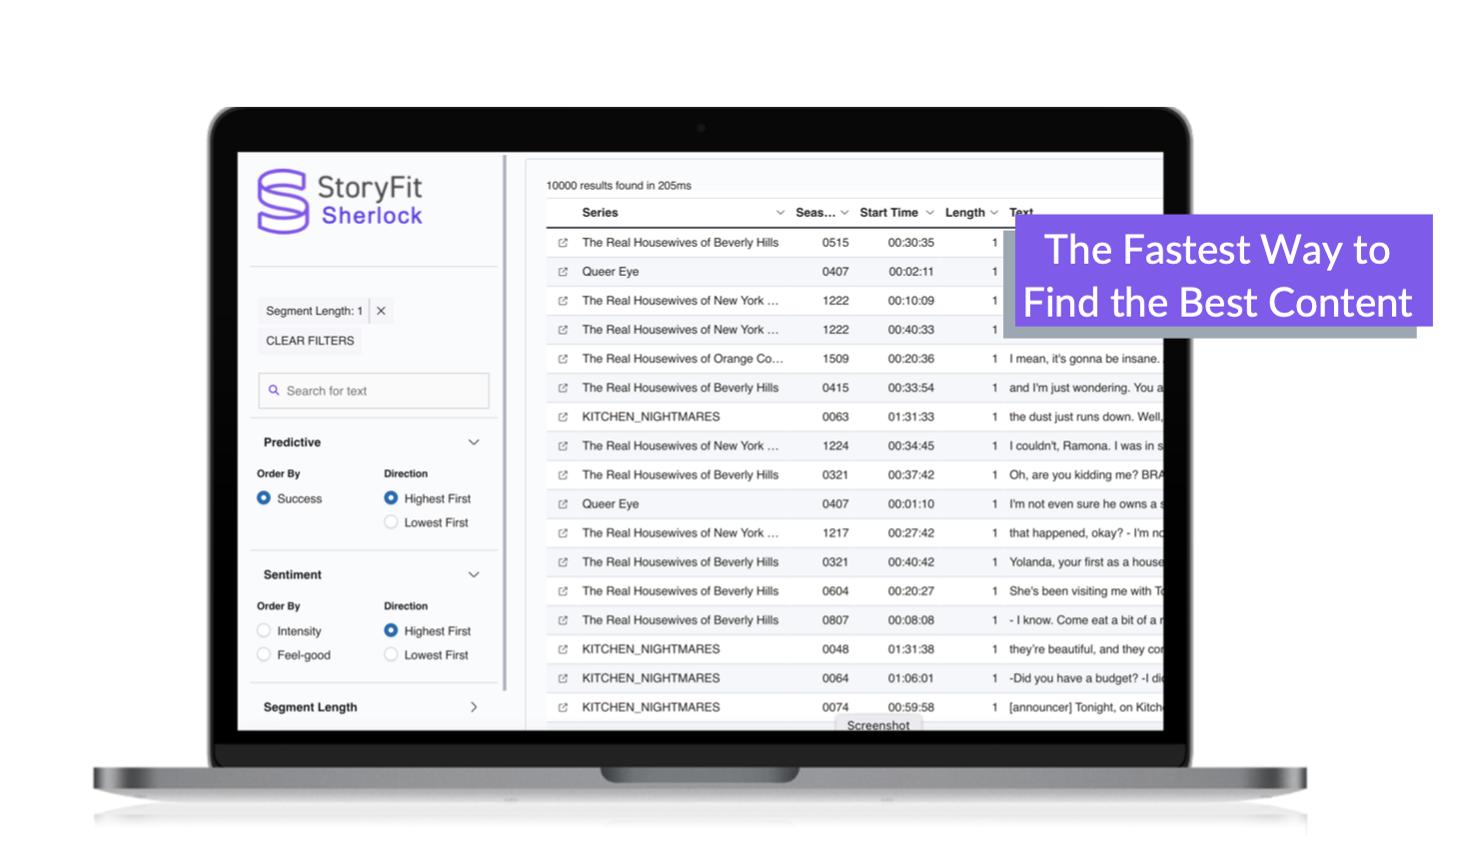 StoryFit Sherlock